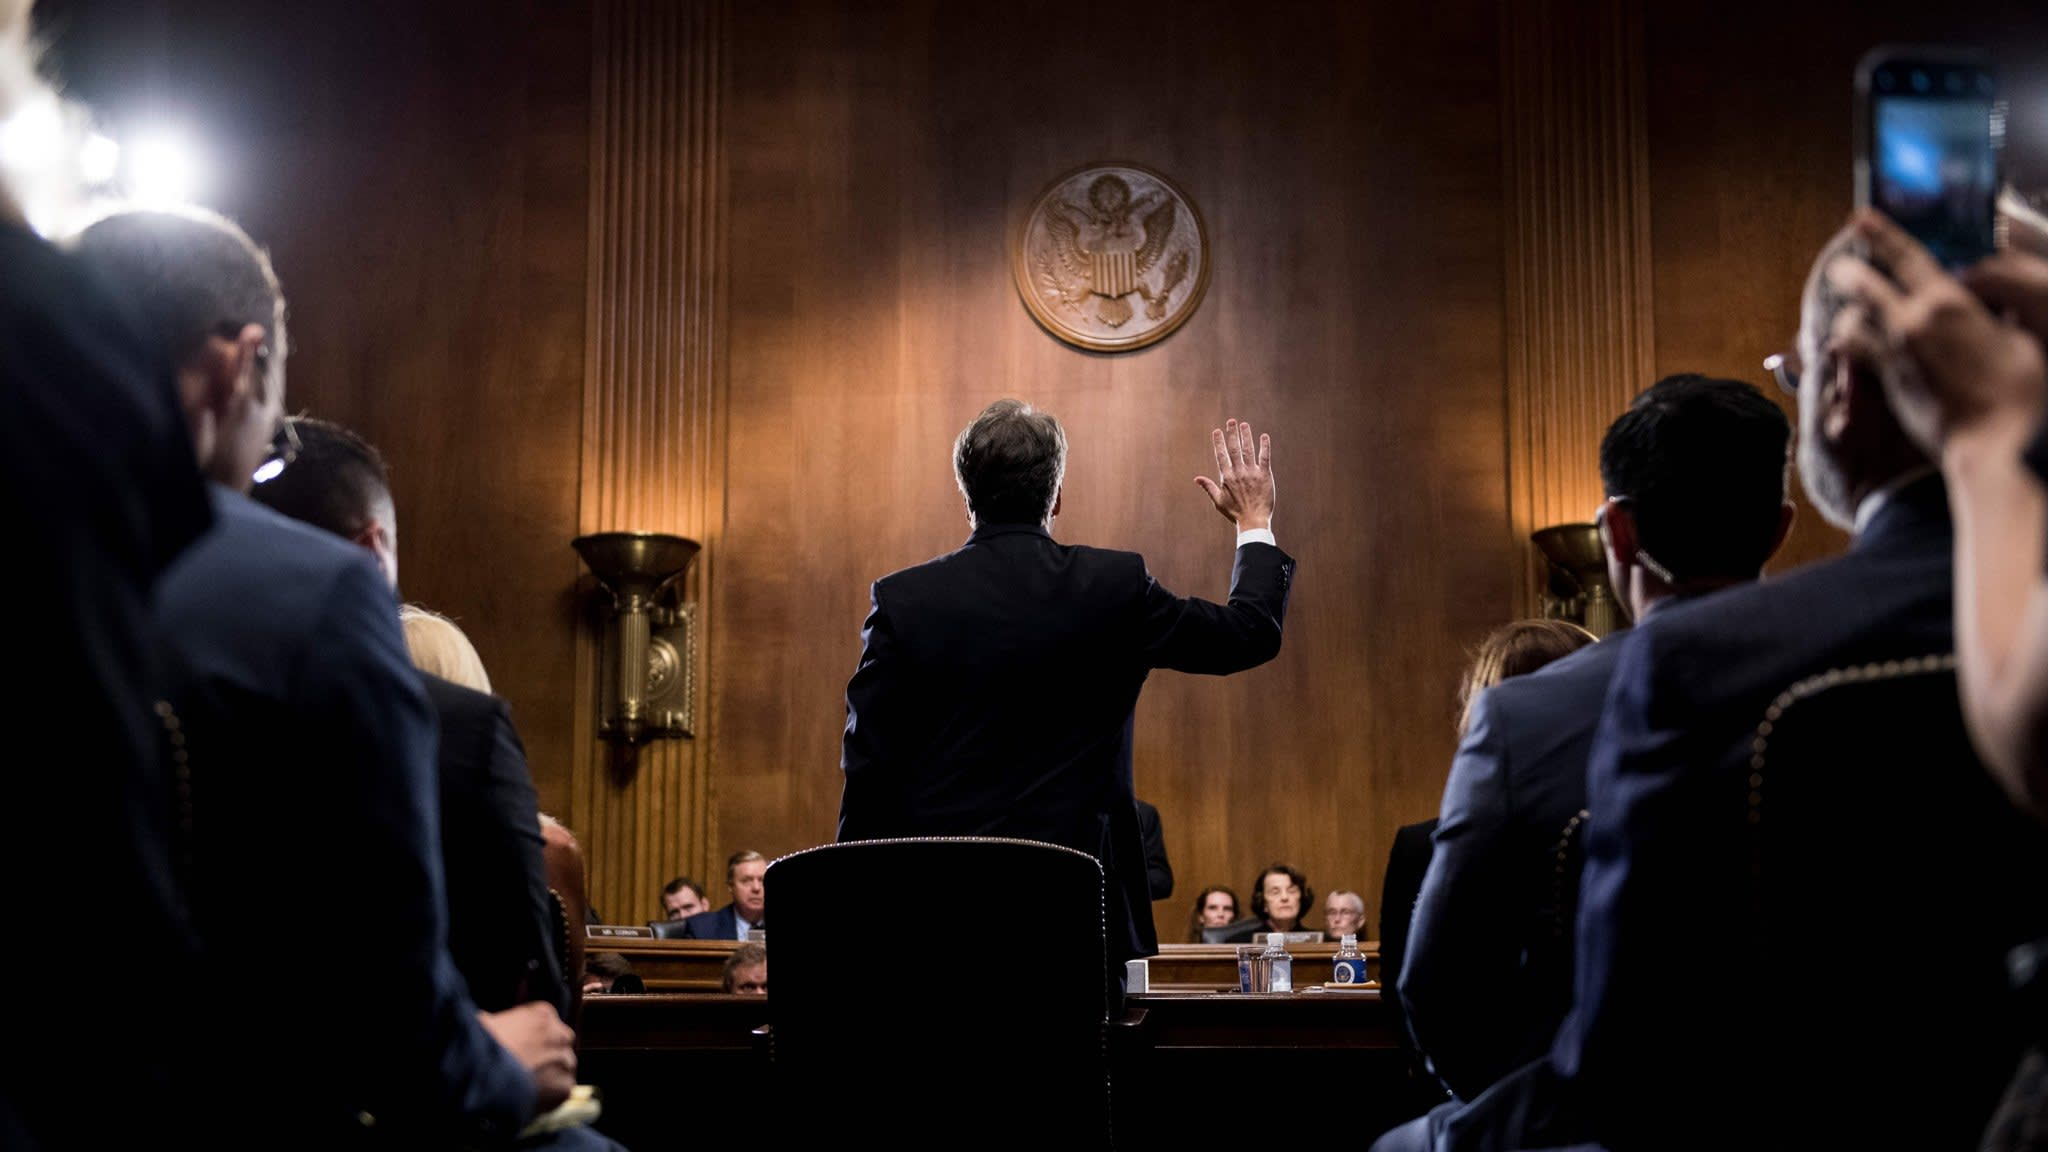 Divided Senate votes to confirm Brett Kavanaugh to US Supreme Court